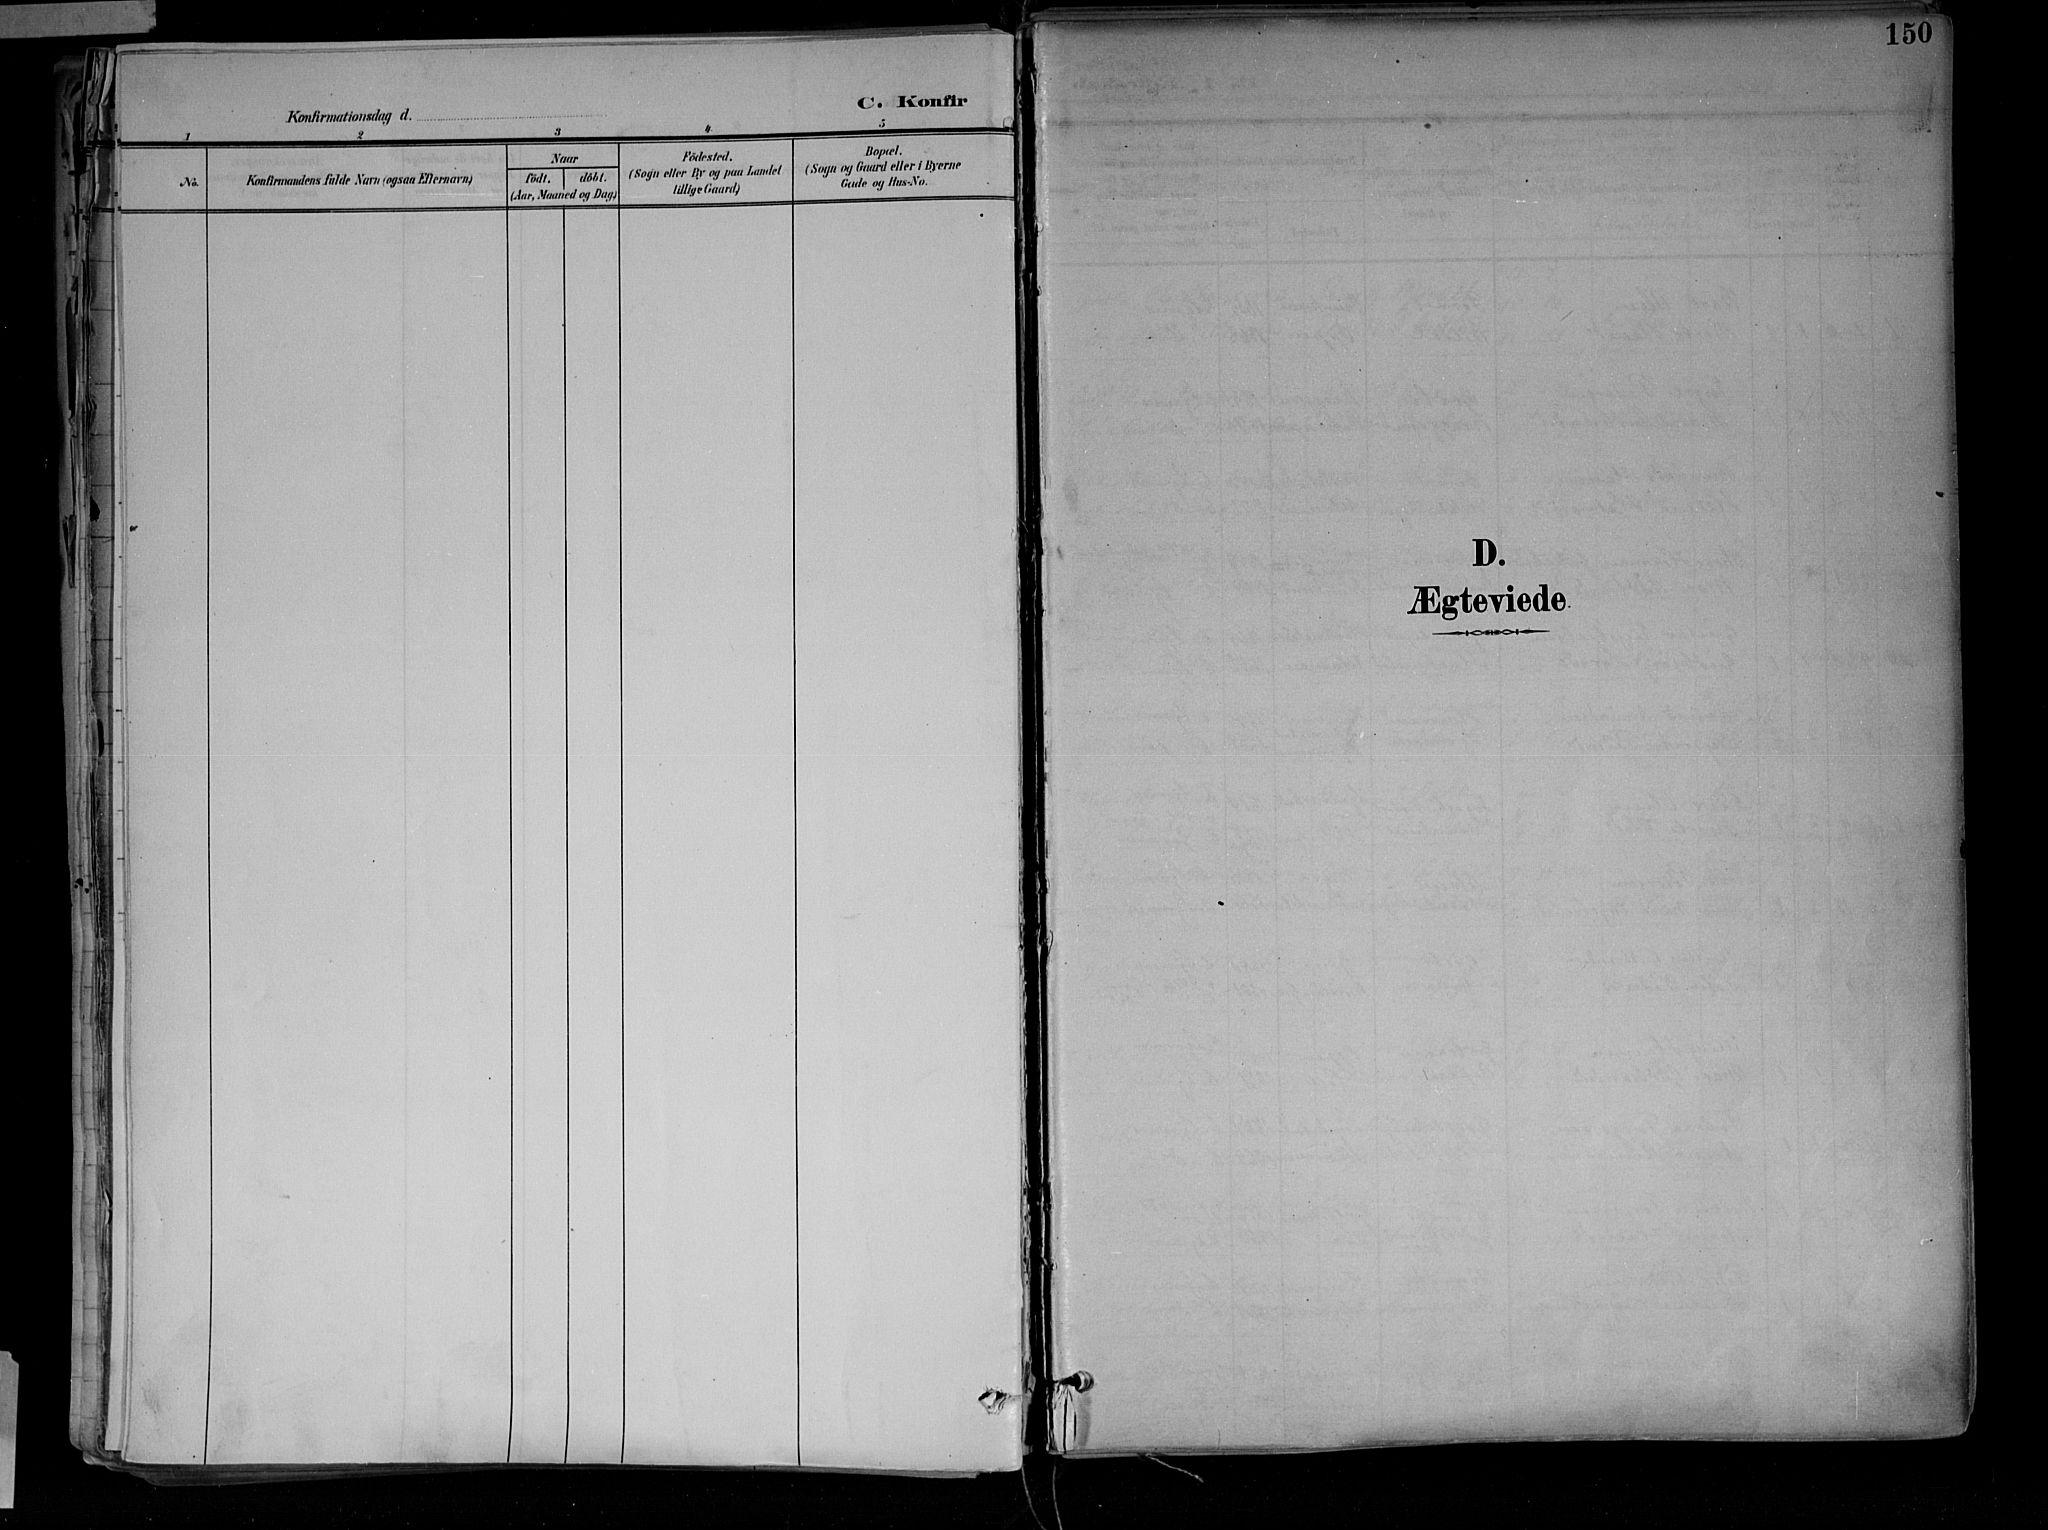 SAH, Jevnaker prestekontor, Ministerialbok nr. 10, 1891-1906, s. 150